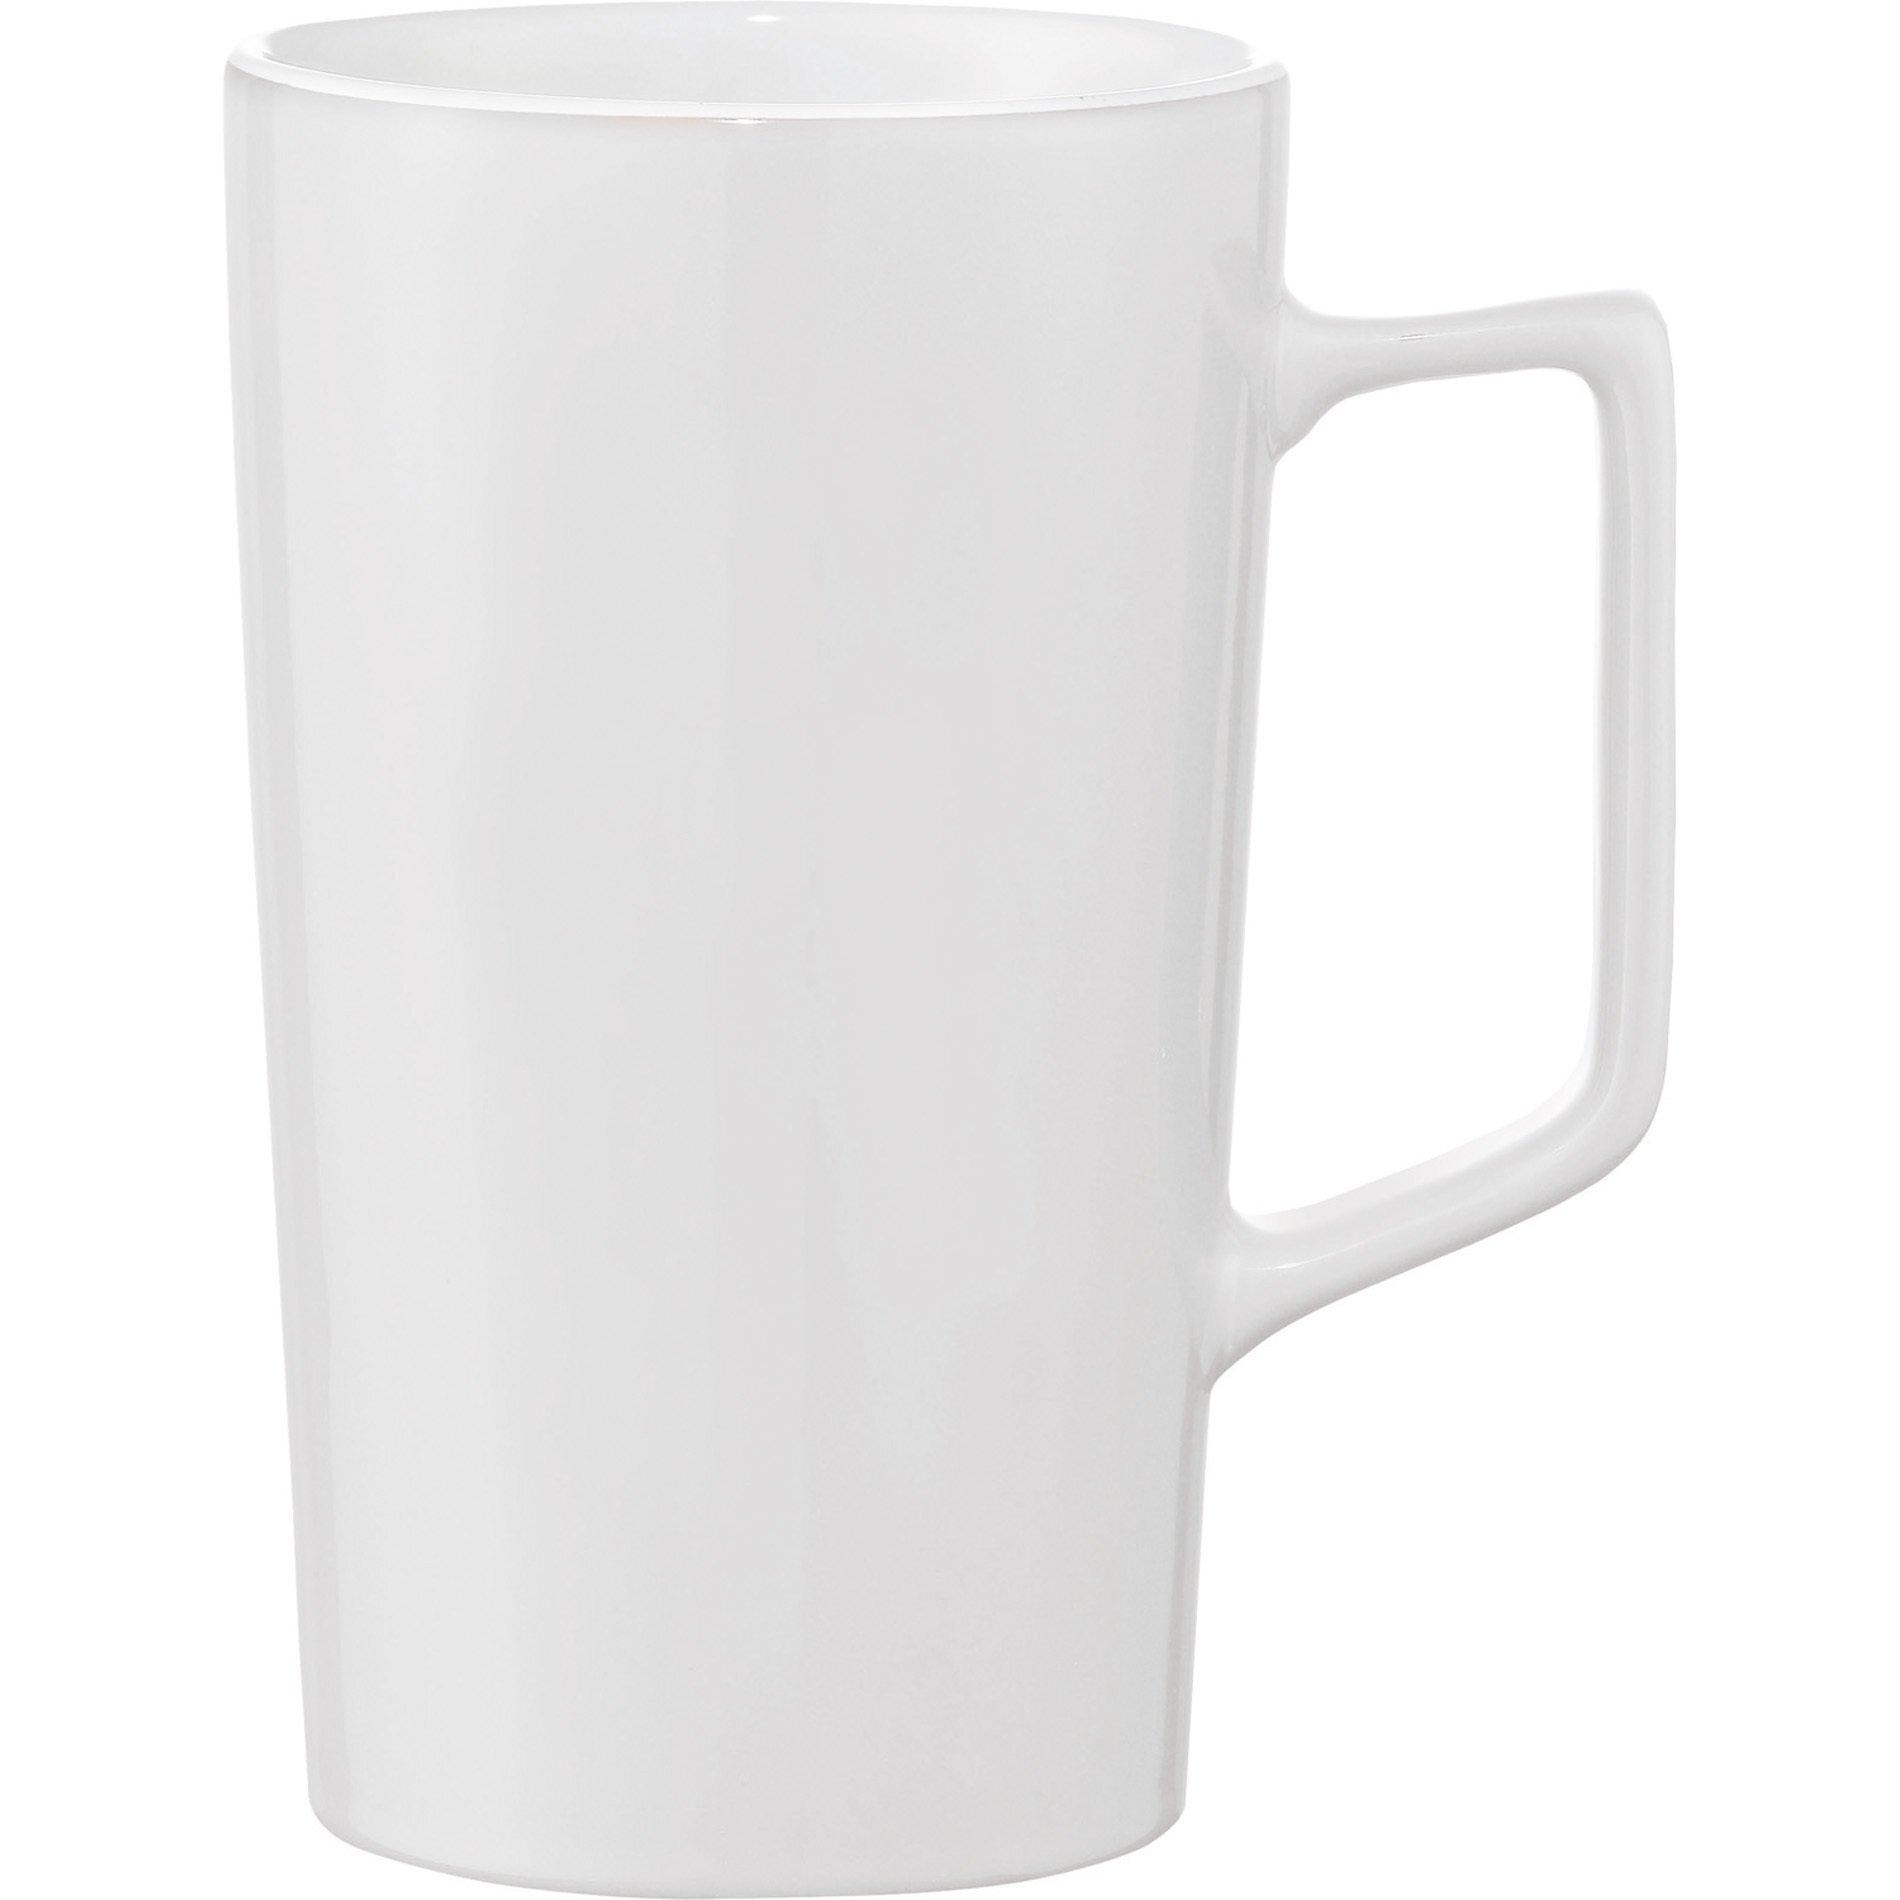 Venti Ceramic Mug, 20oz. - Free Set Up Charges!